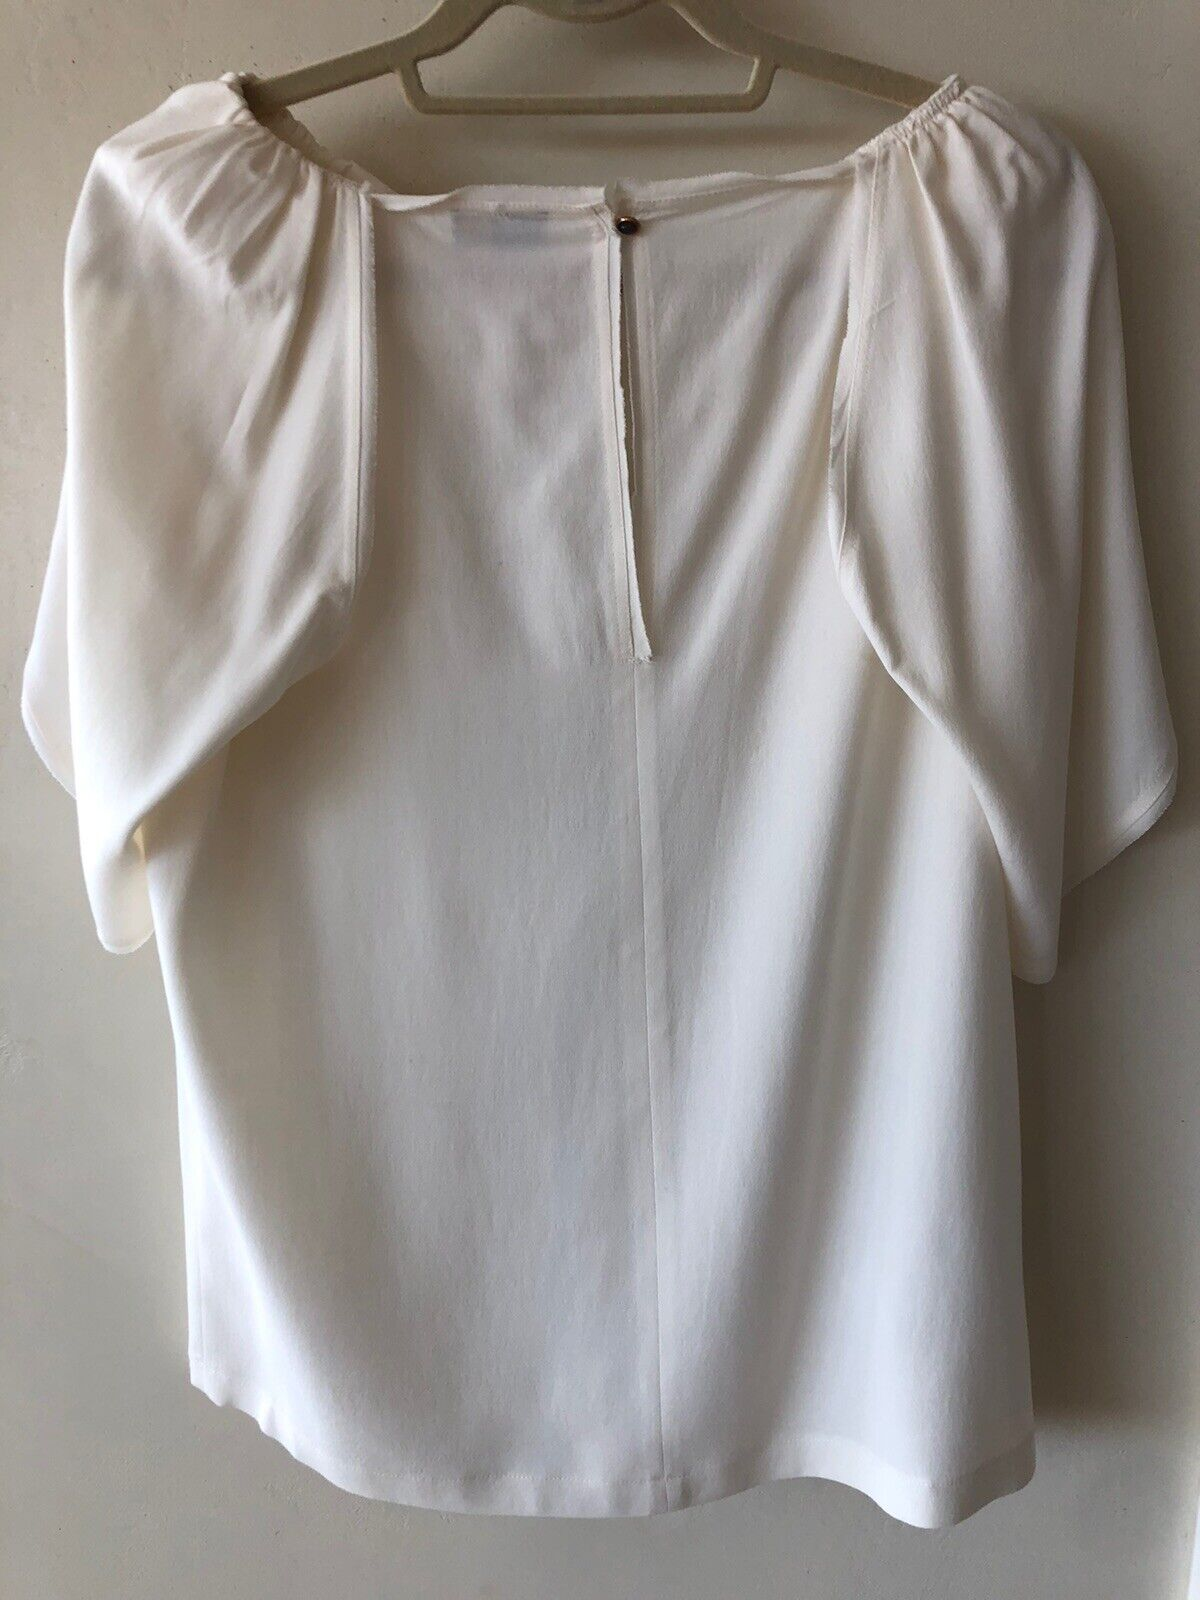 FENDI Silk Ruffle White Ivory Top Blouse SZ 44 - image 3